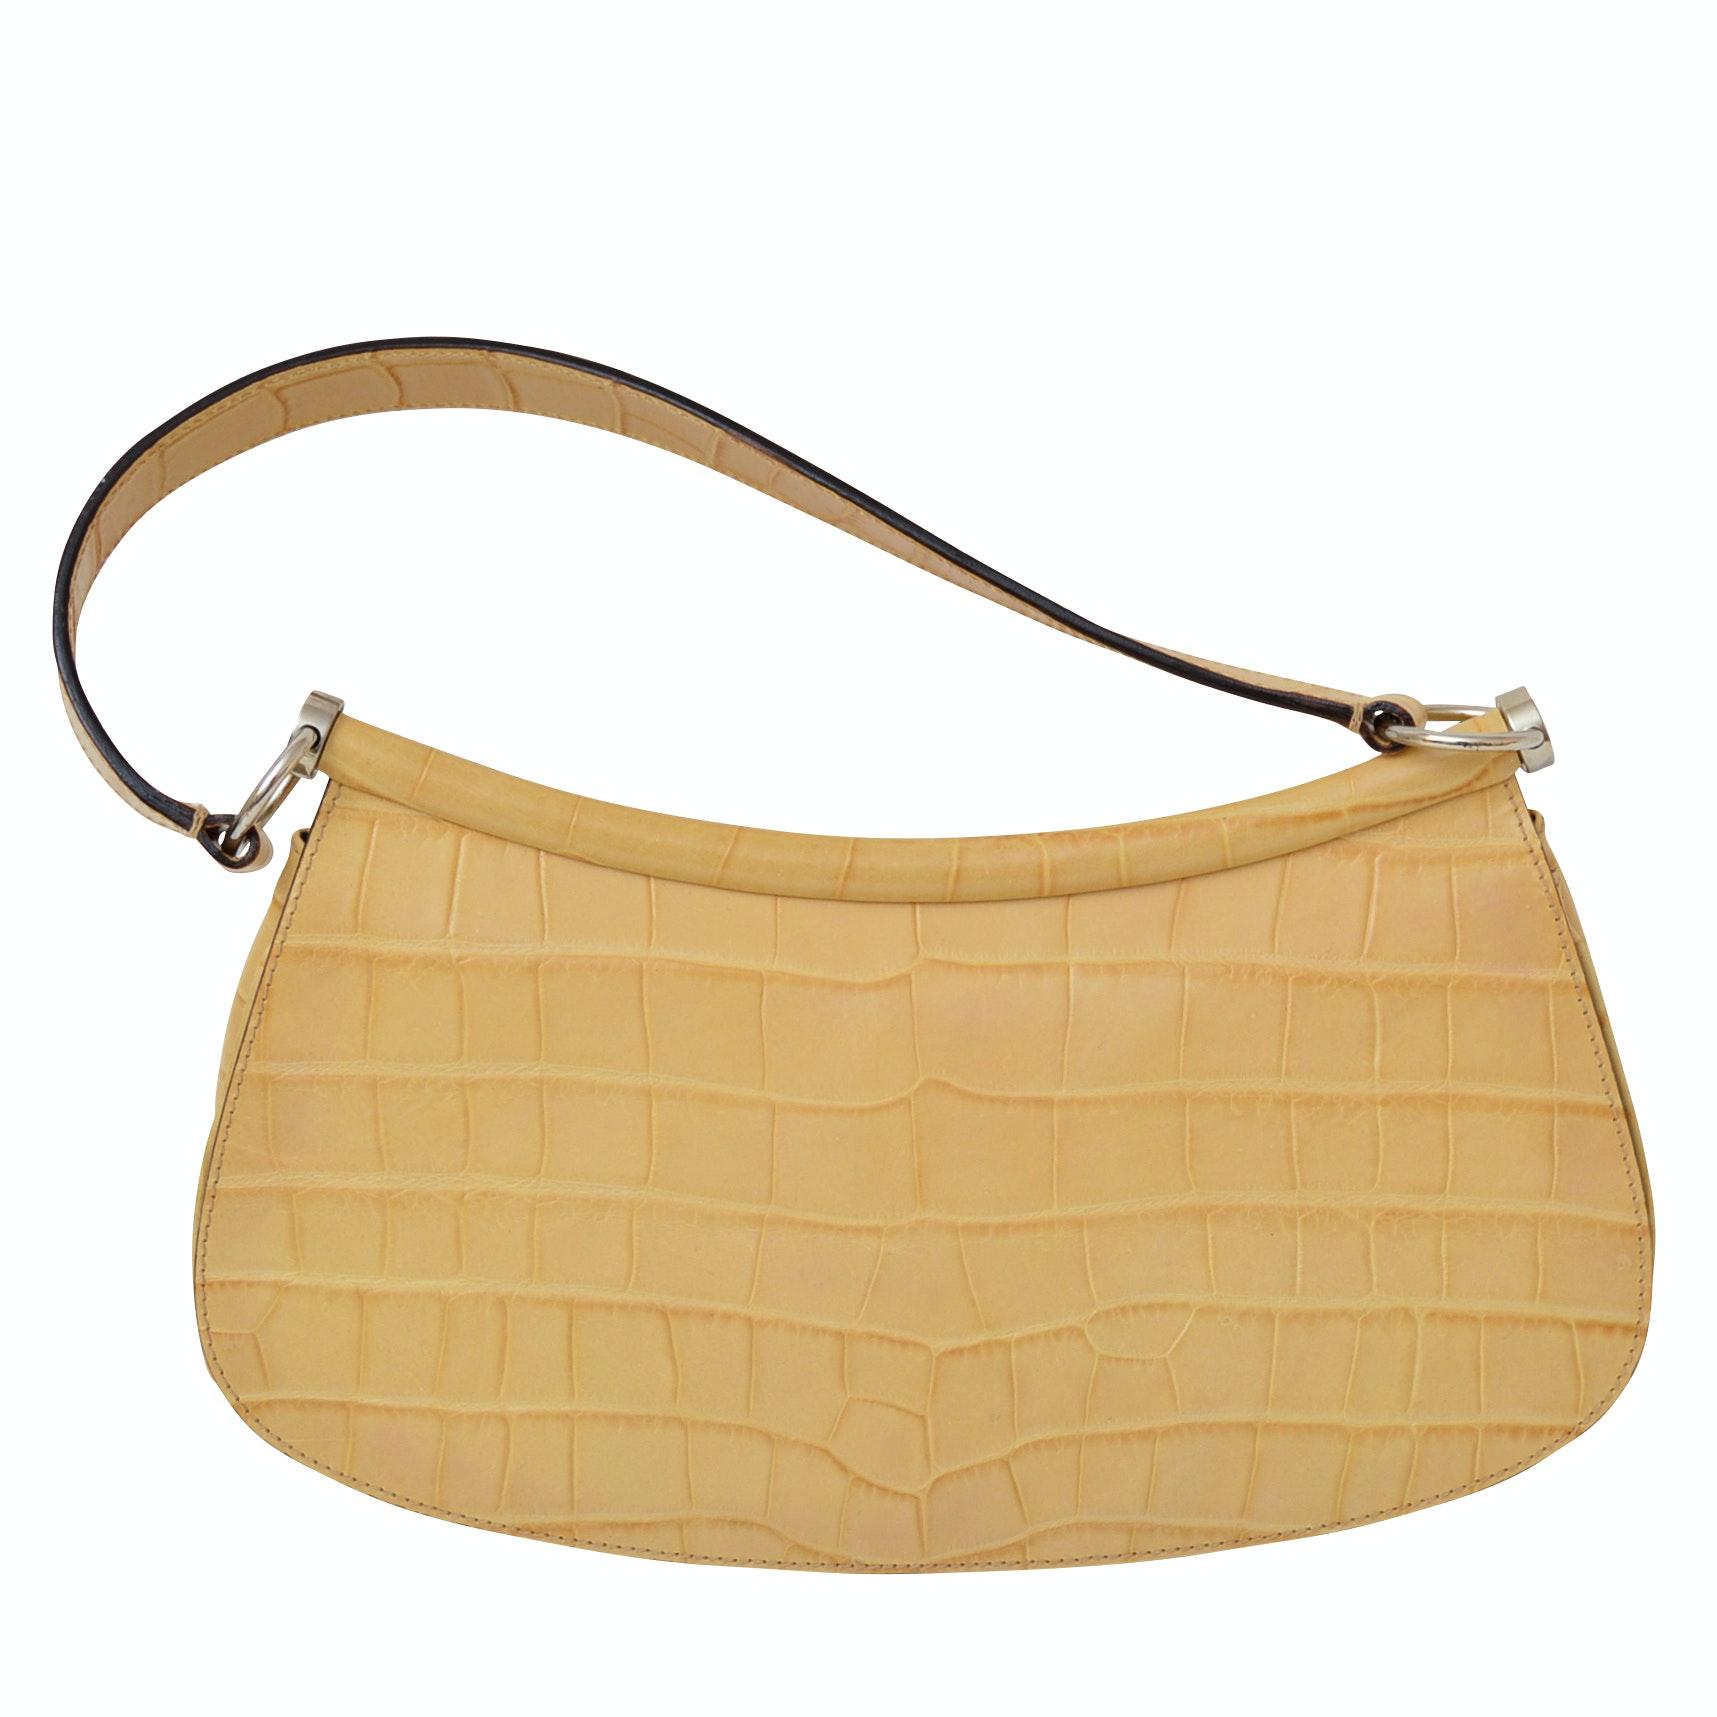 Escada Croc-Textured Leather Handbag